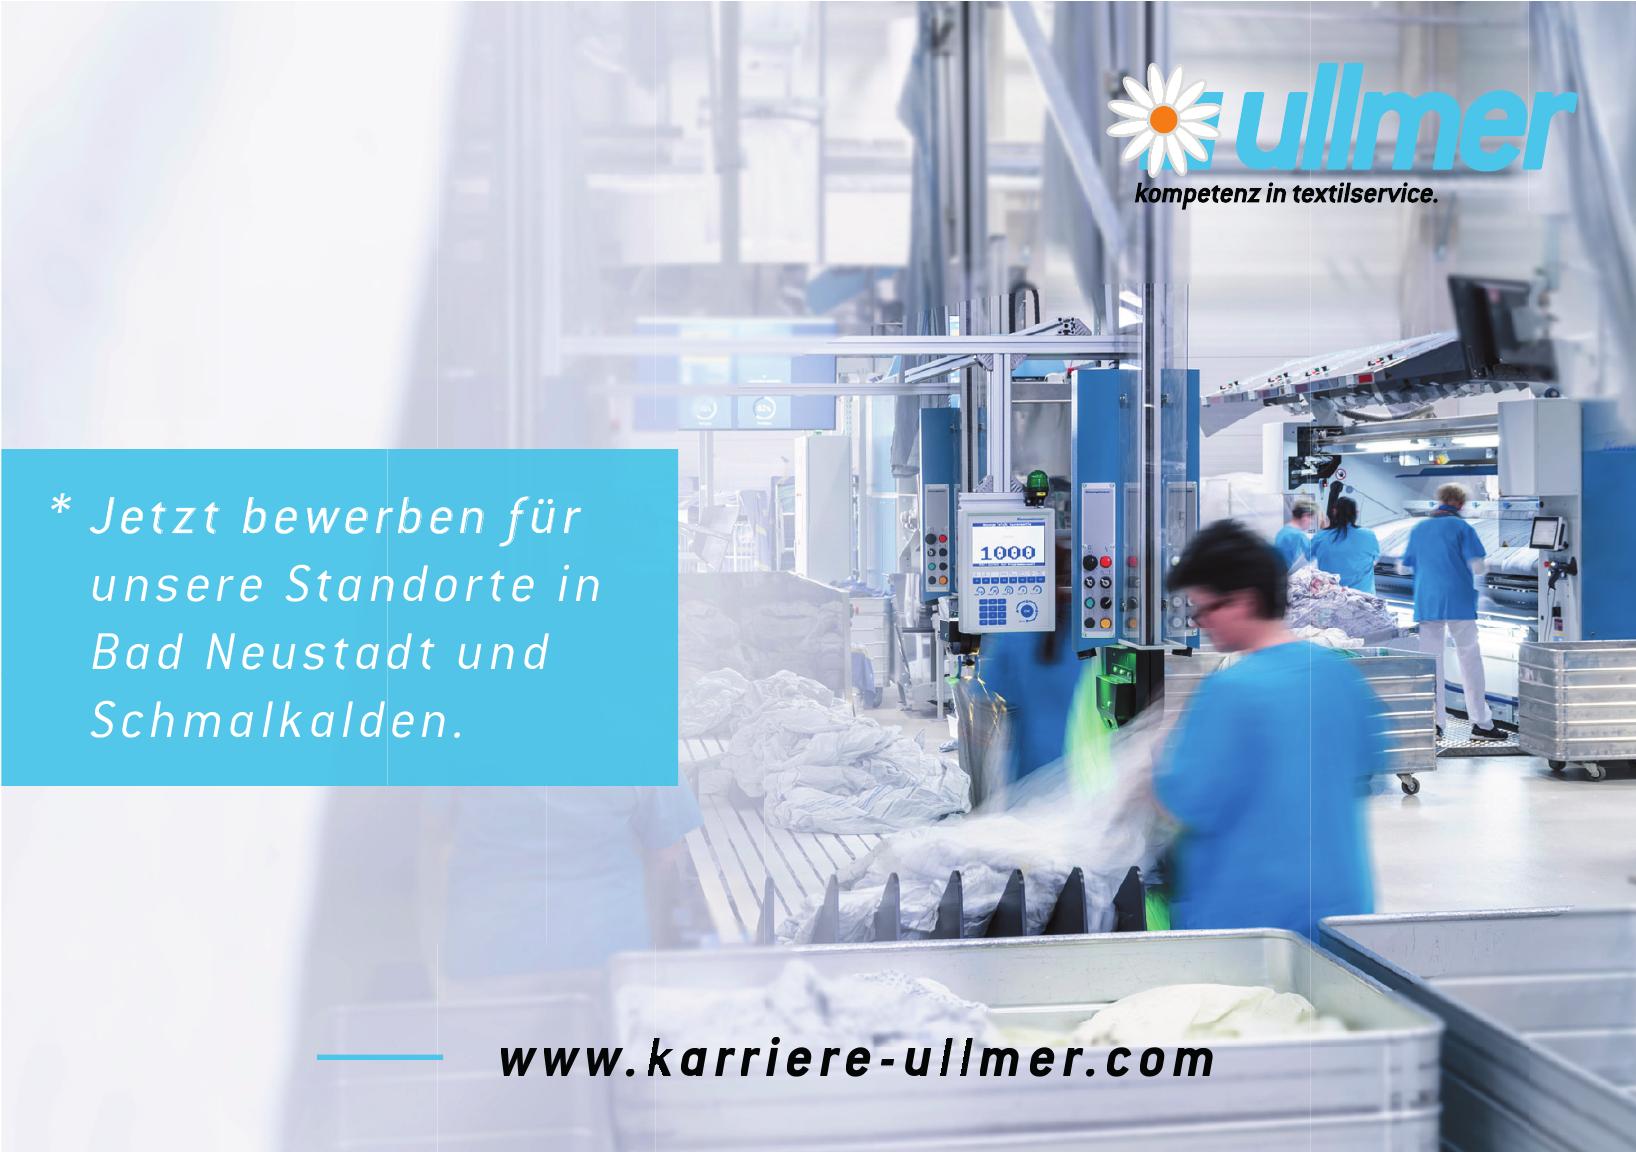 Ullmer Kompetenz in Textilservice